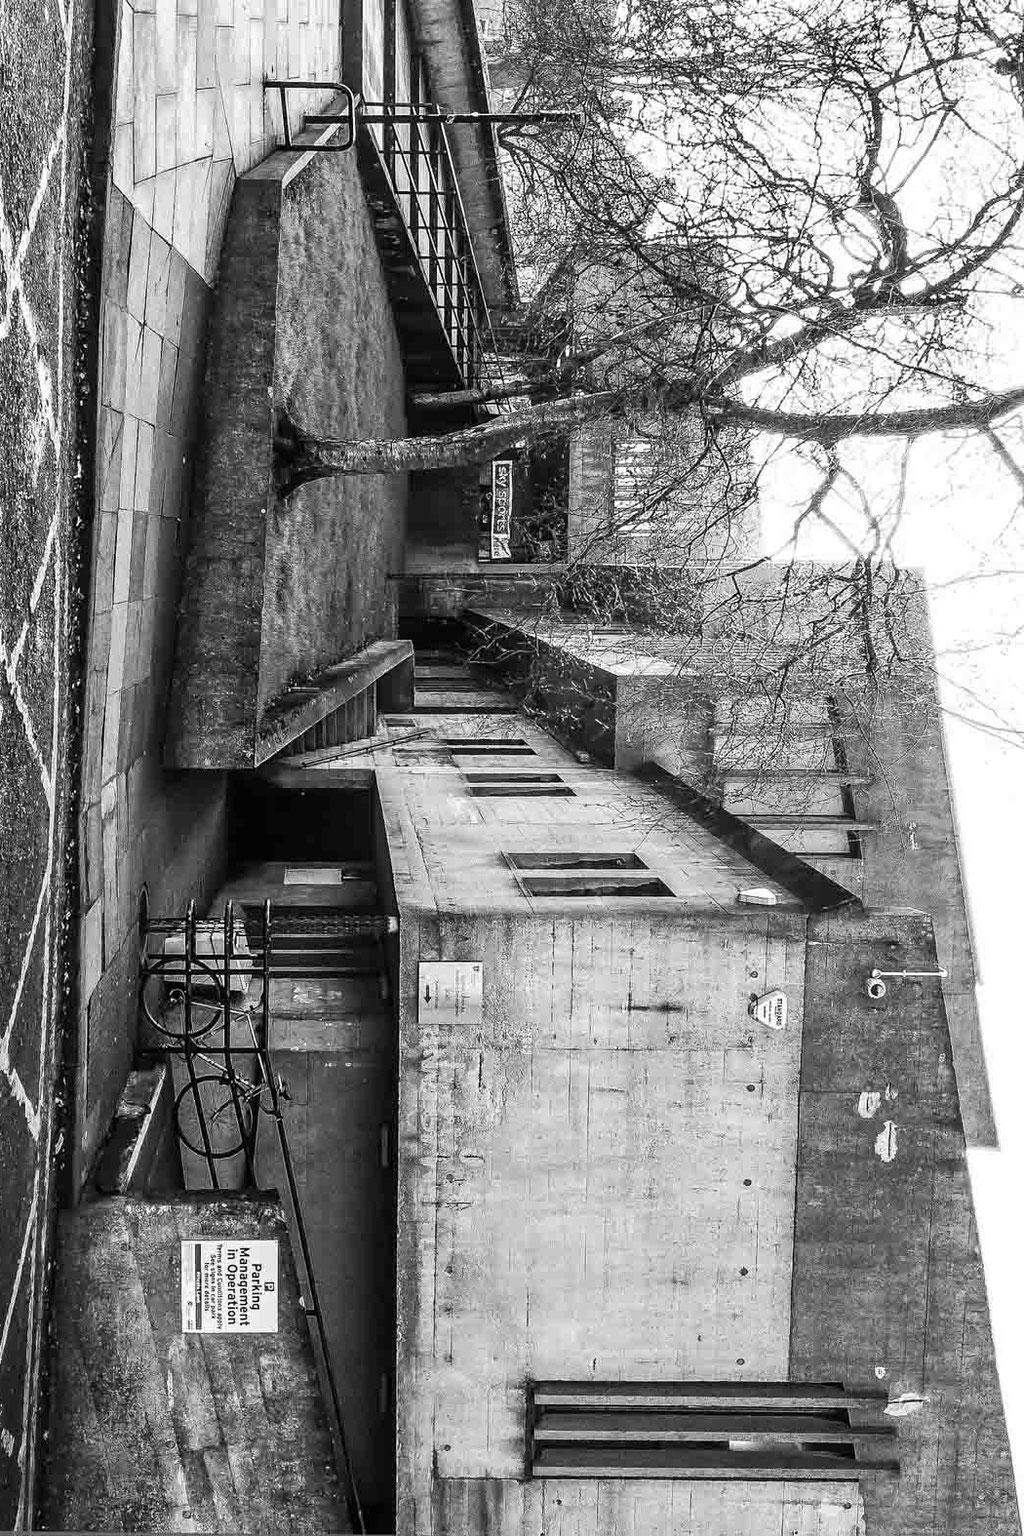 Dunelm House, Durham University (Ove Arup & Partners), Durham (UK)